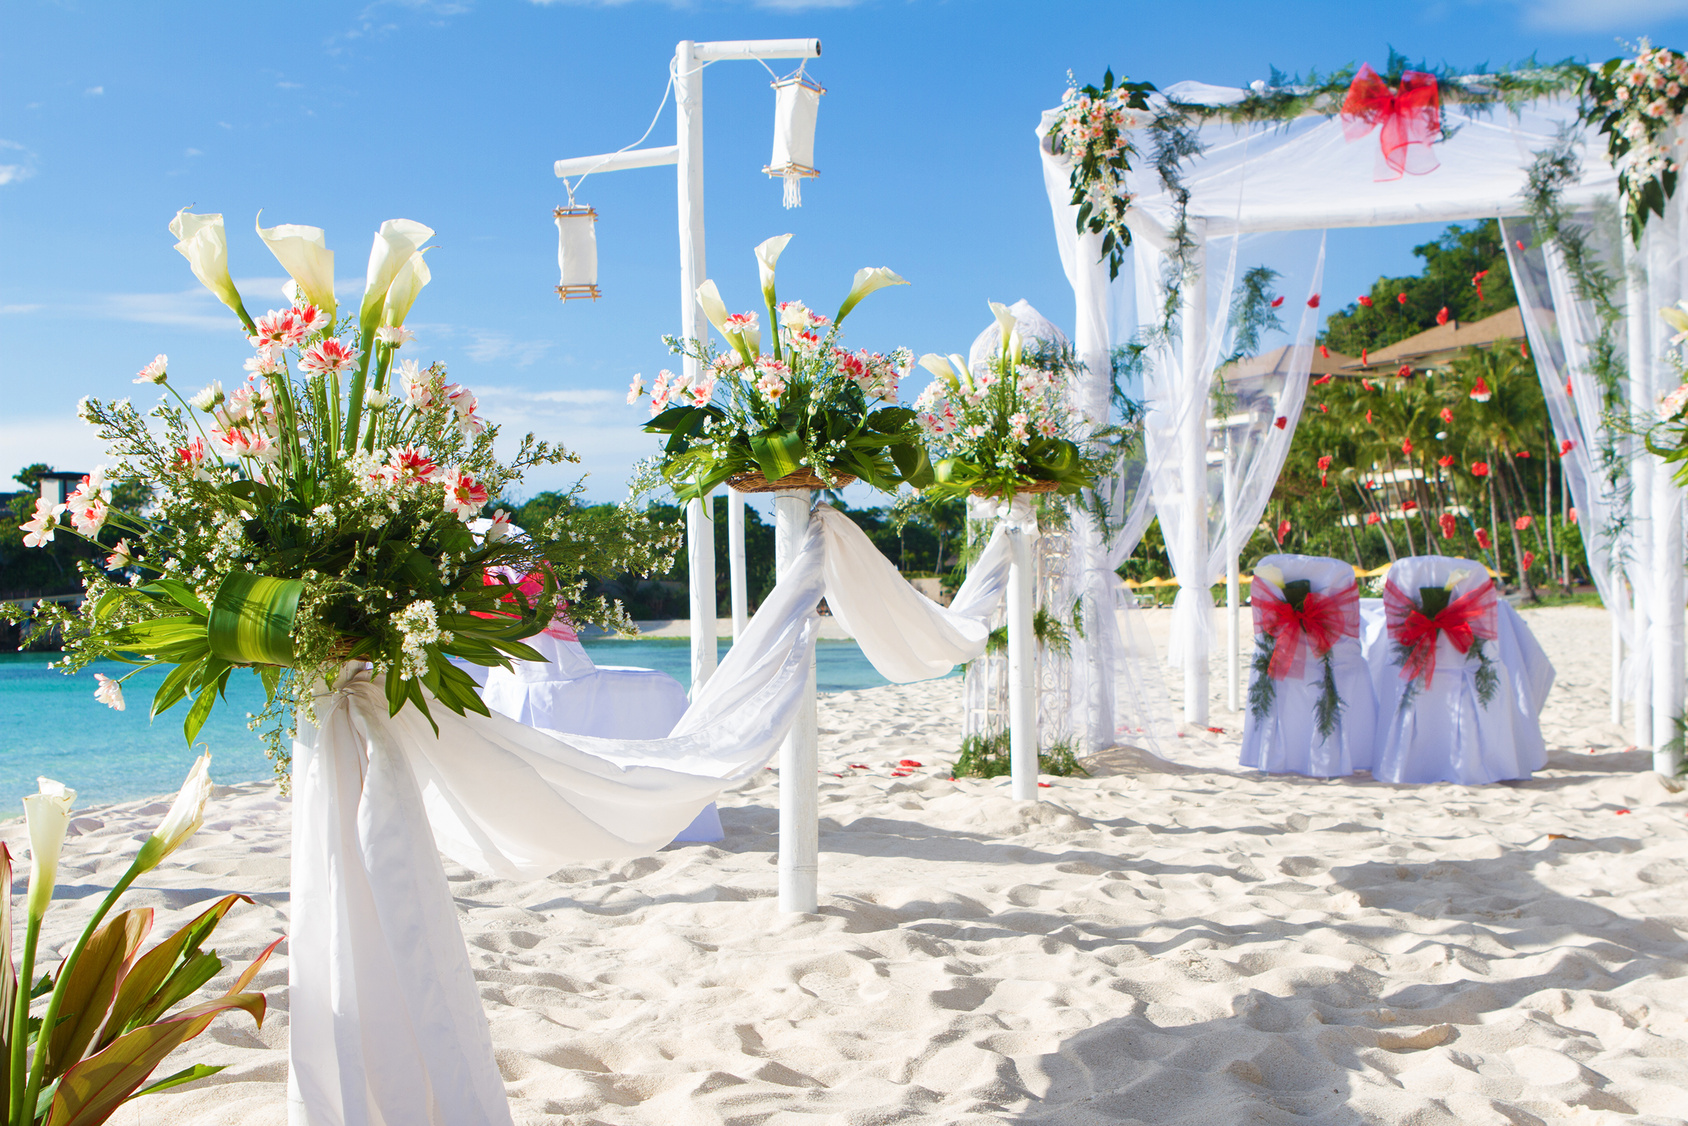 Zaask Casamentos')